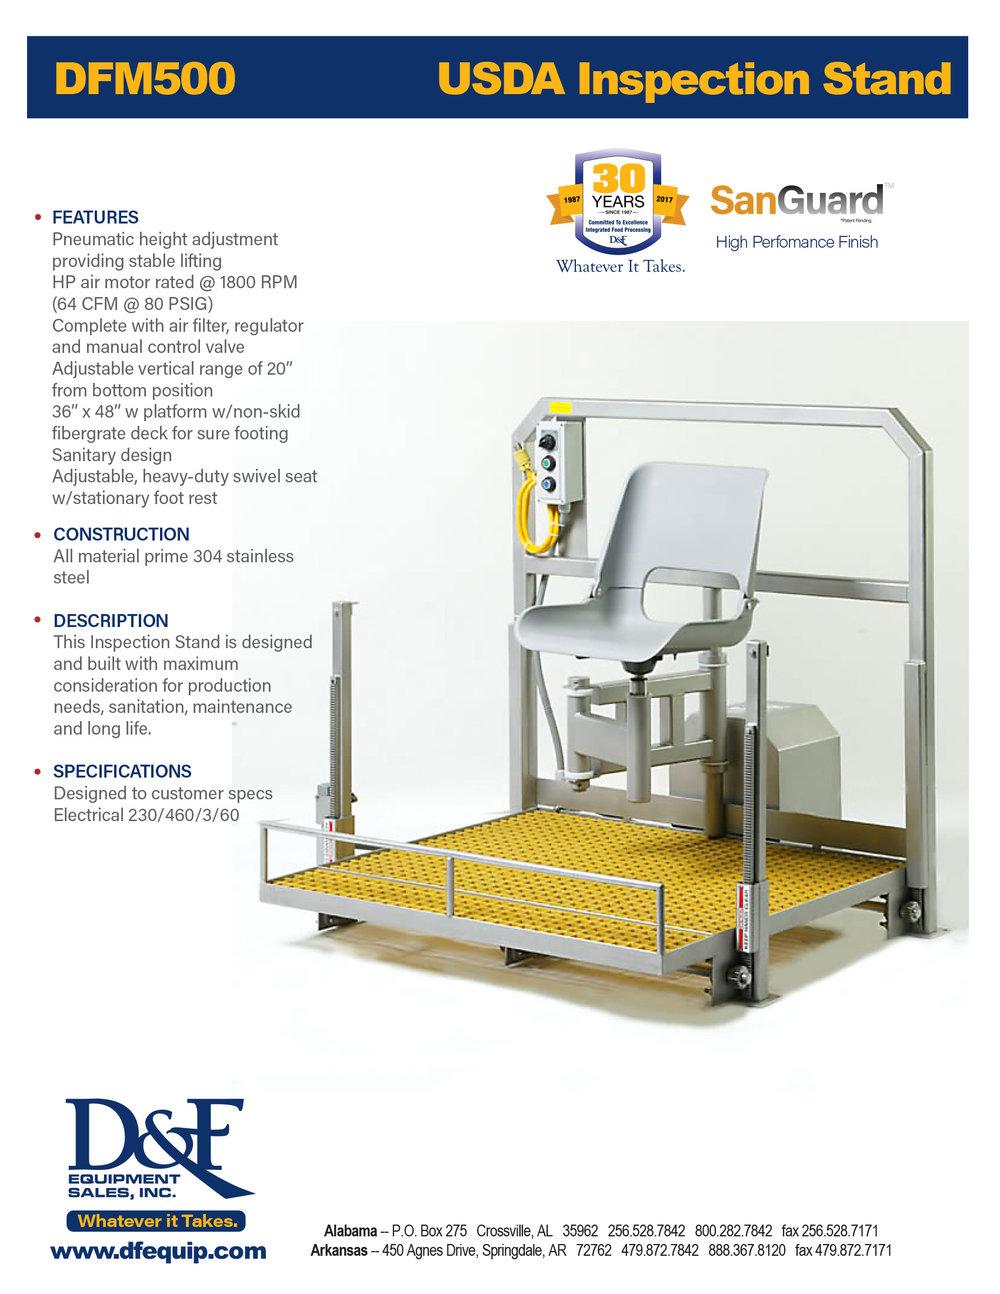 DFM500-USDAInspectionStand-w-seat2017.jpg